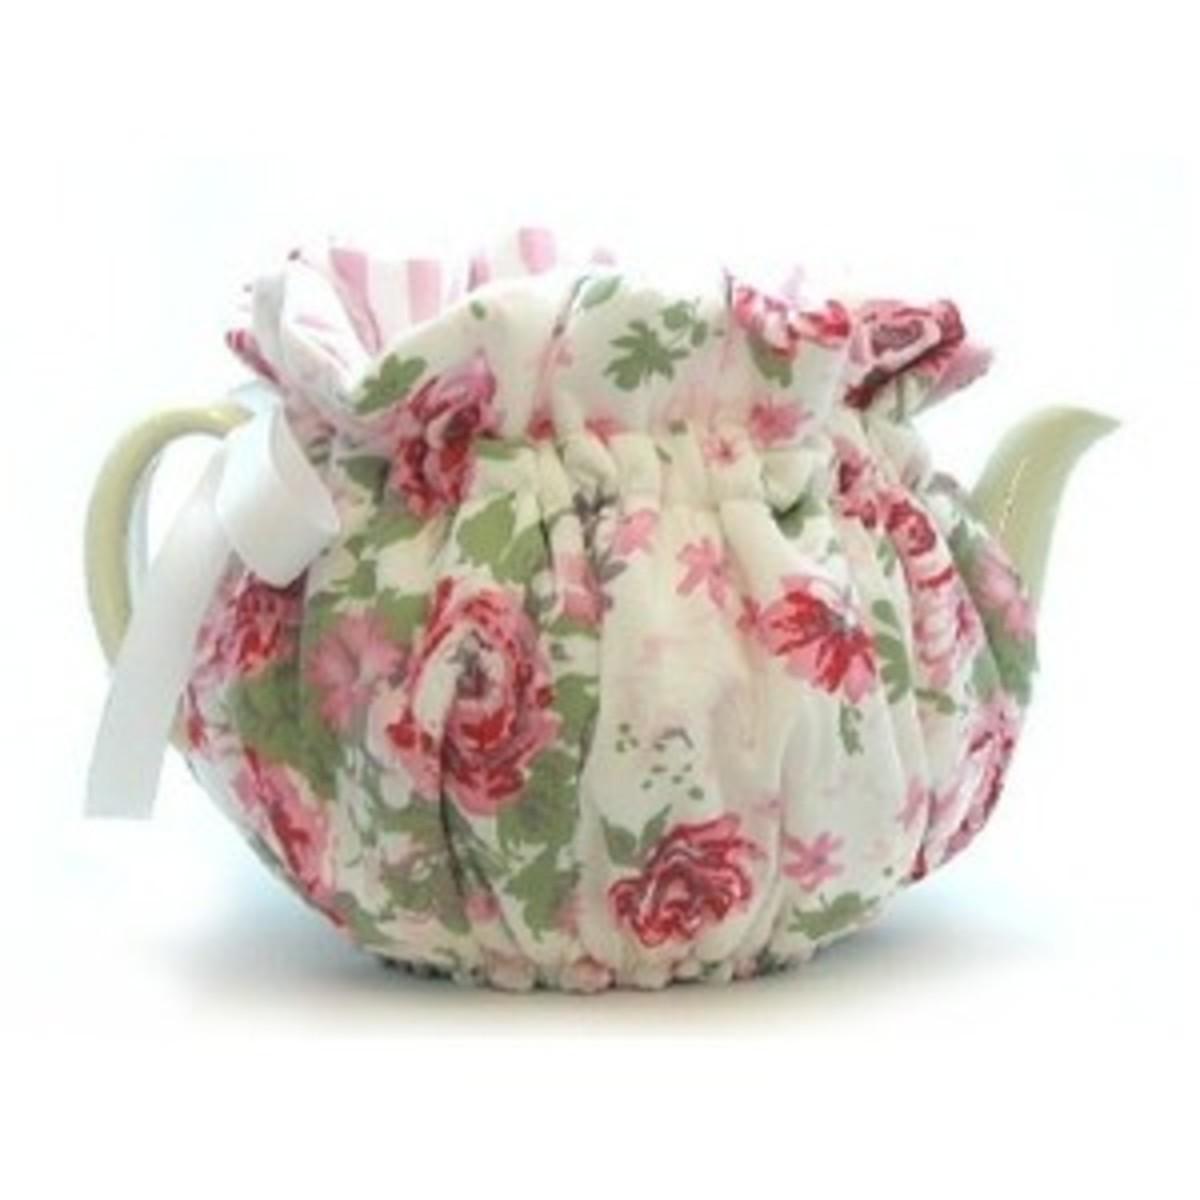 old-fashion-recipes-for-morning-tea